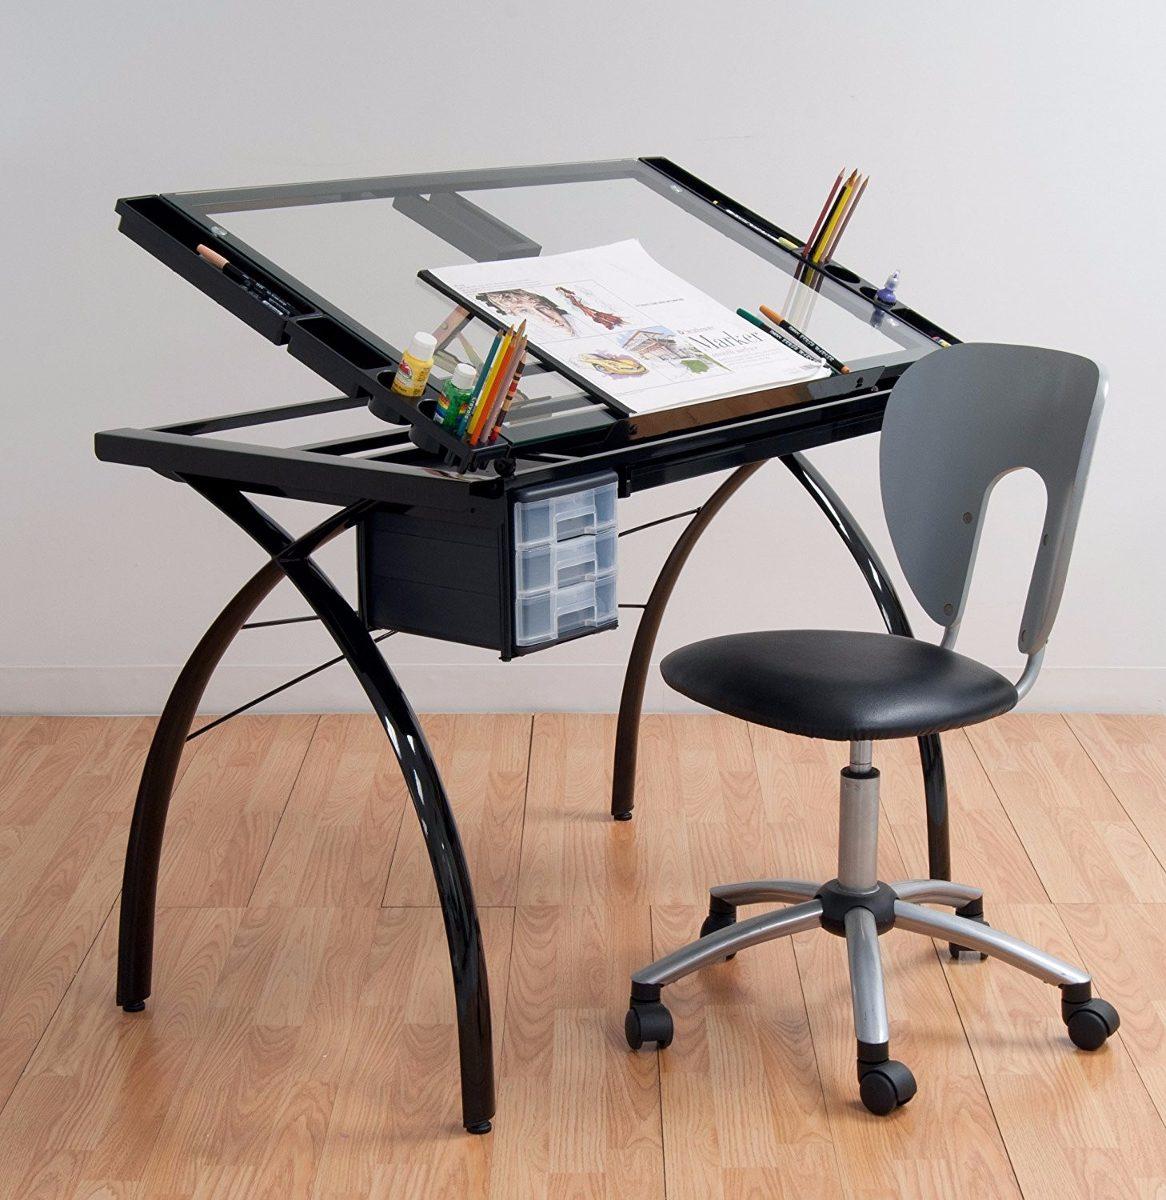 Mesa dibujo escritorio cristal templado restirador negro for Mesa oficina cristal templado